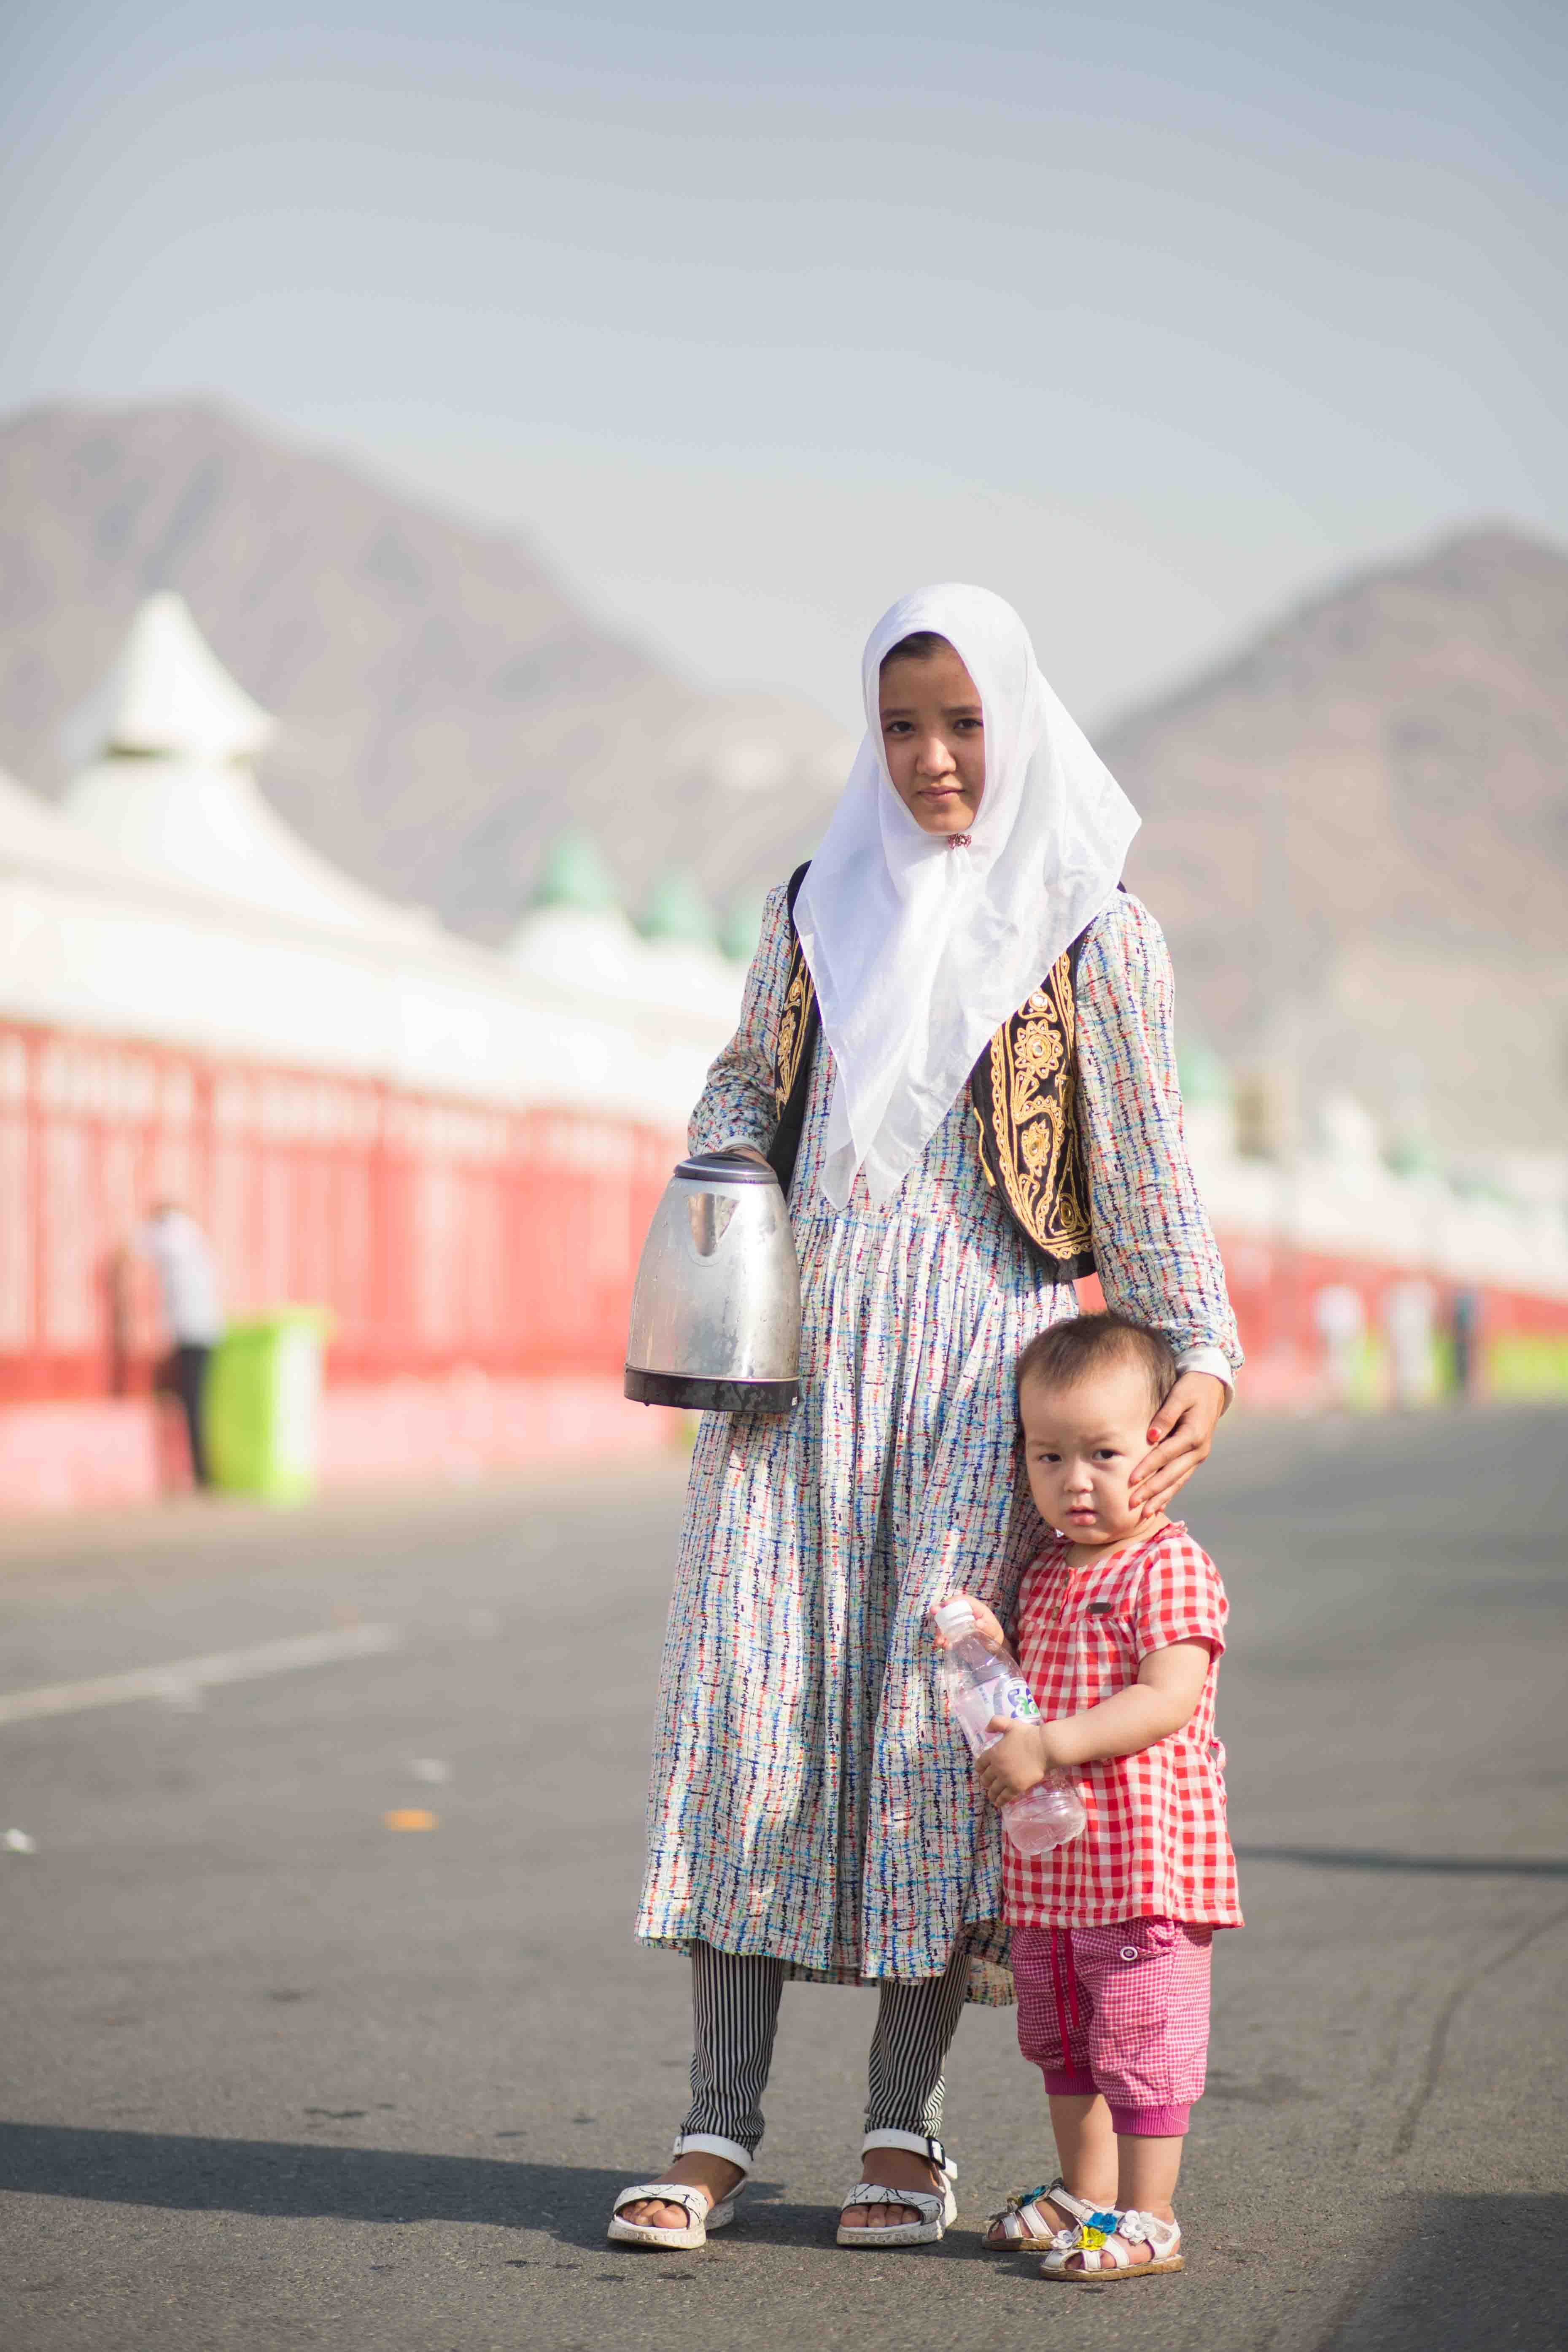 hajj muslim pilgrimage